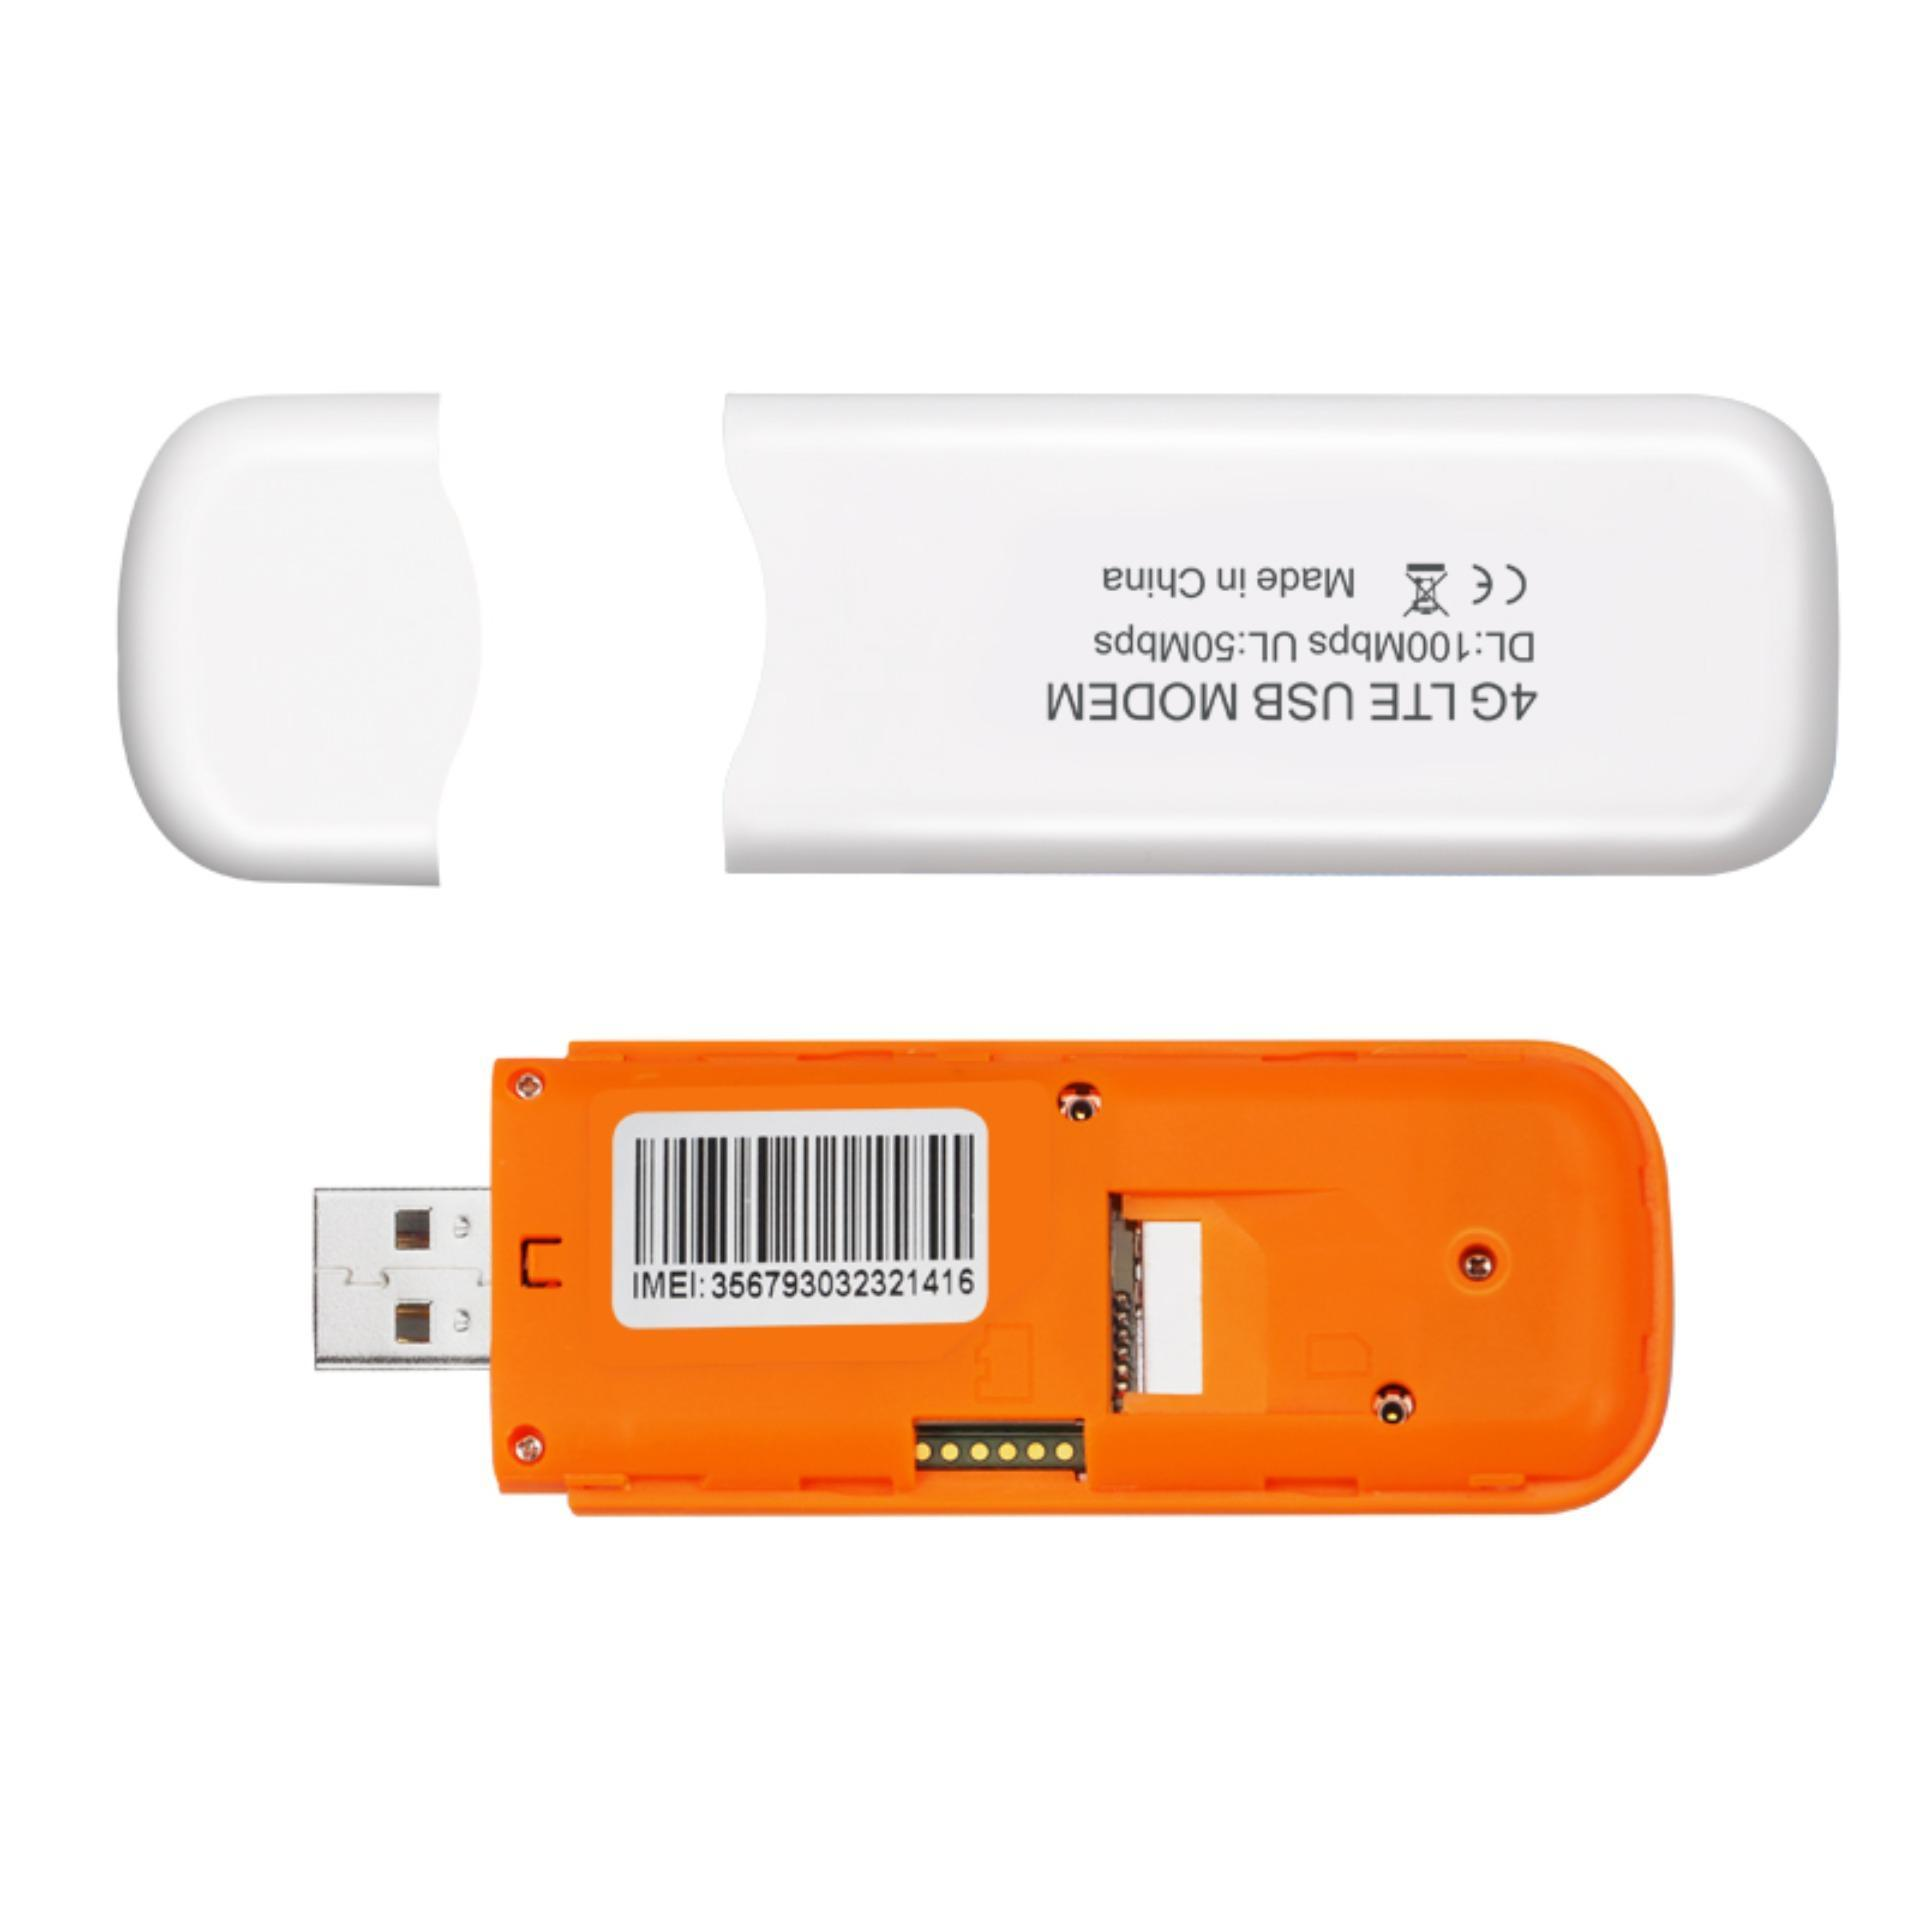 FLORA Portable 4G LTE Internet Wireless USB Modem USB Dongle B1 B3Brand (